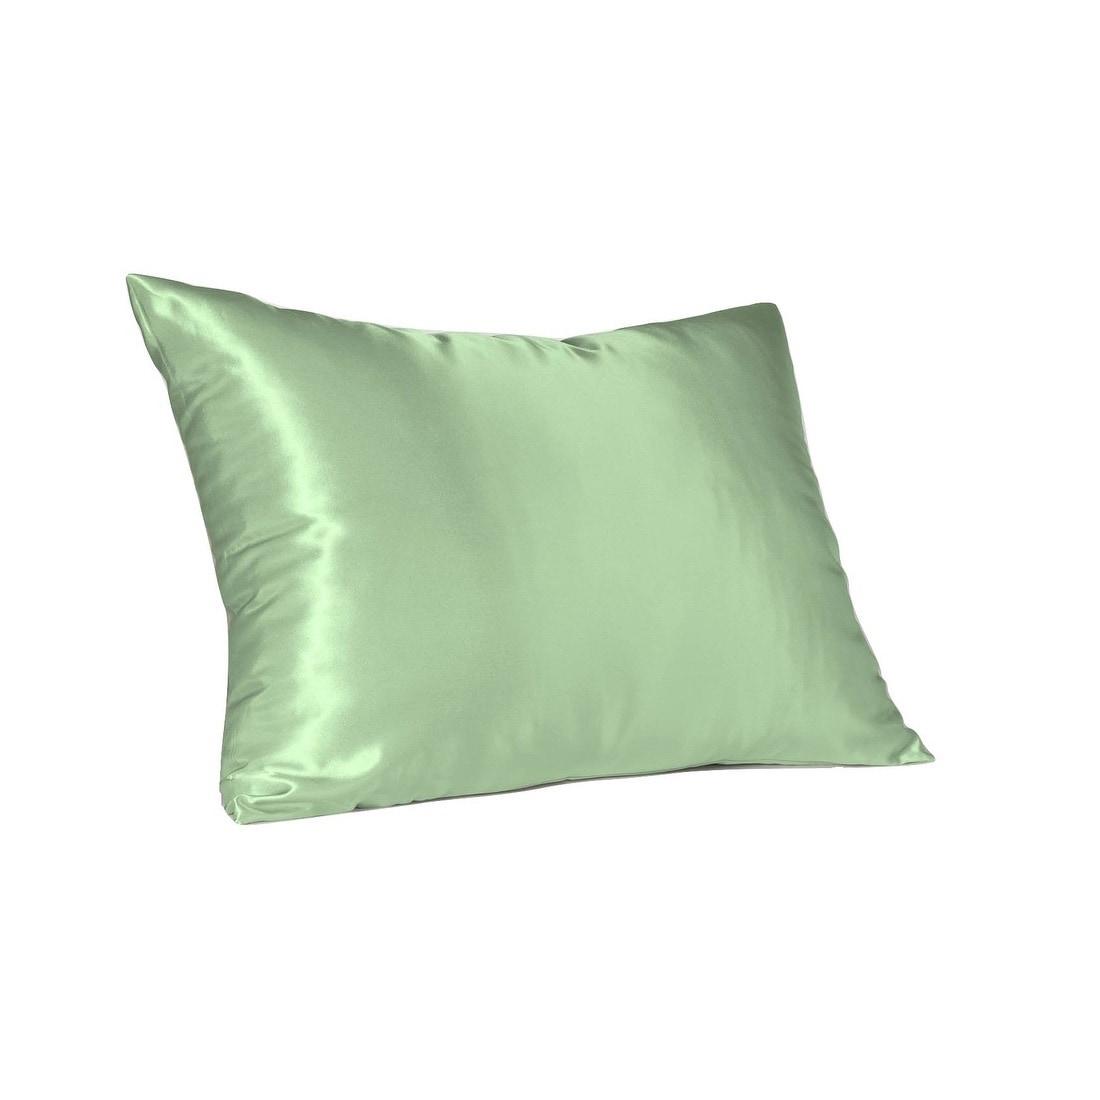 Standard Satin Silk Pillowcase Soft Cover Home Sleep Bedding Pillow Case